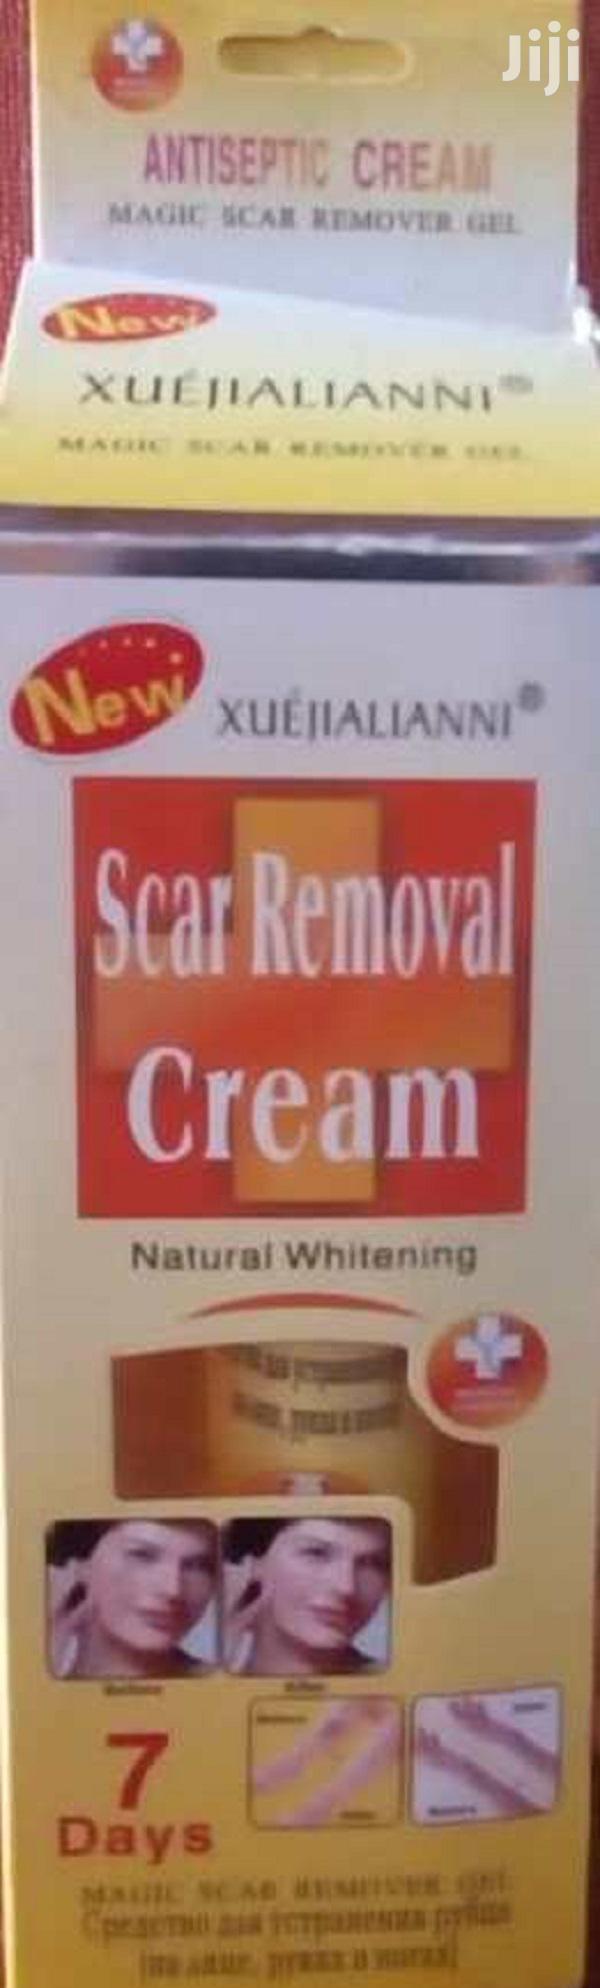 Xuejialianni Scar Removal Cream - Natural Whitening